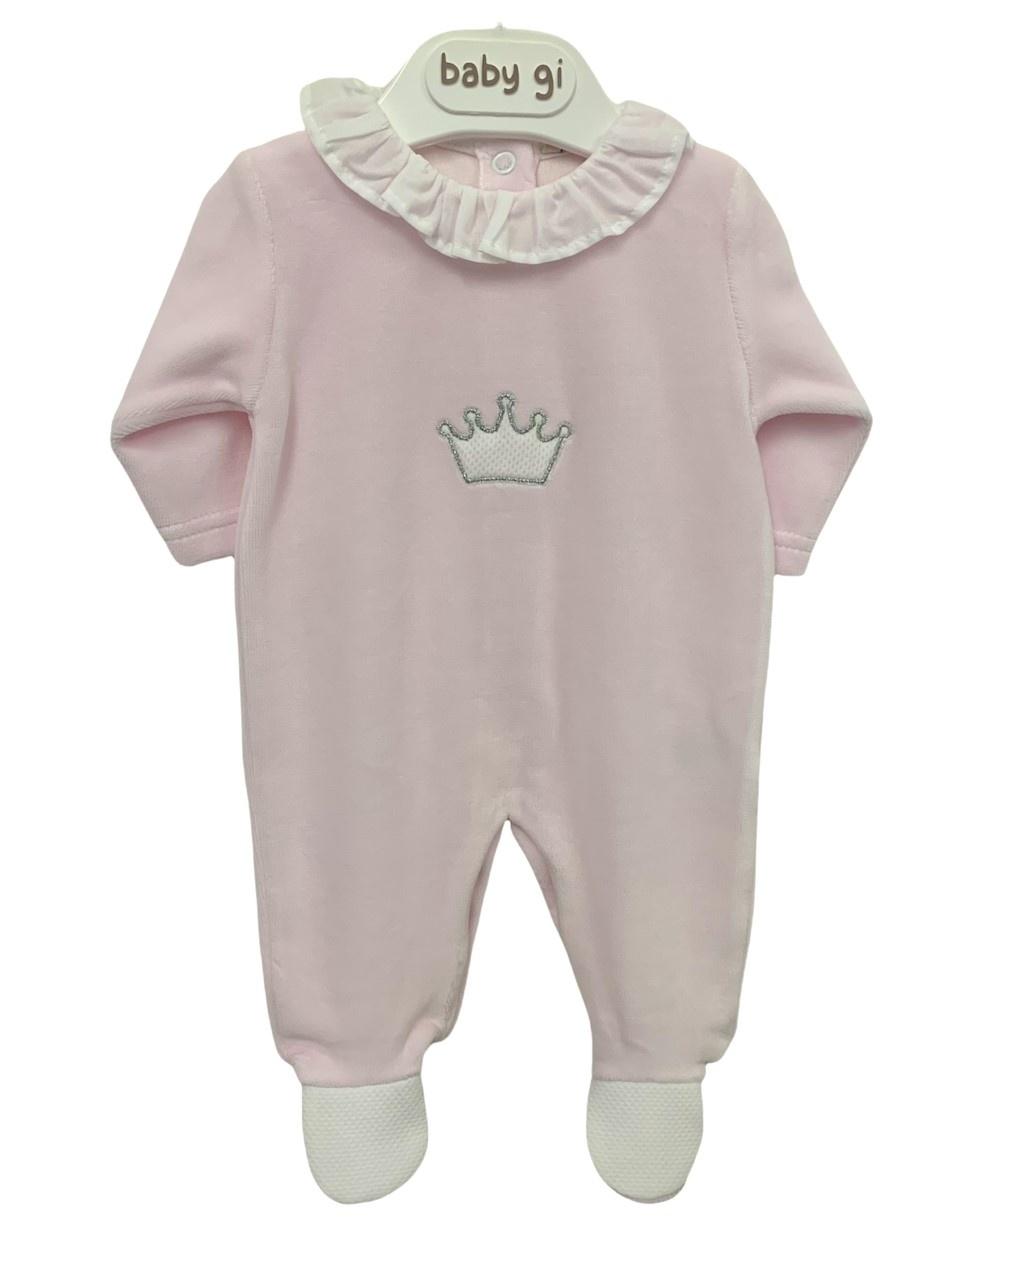 Baby Gi Baby Gi Pink Velour Crown Babygrow